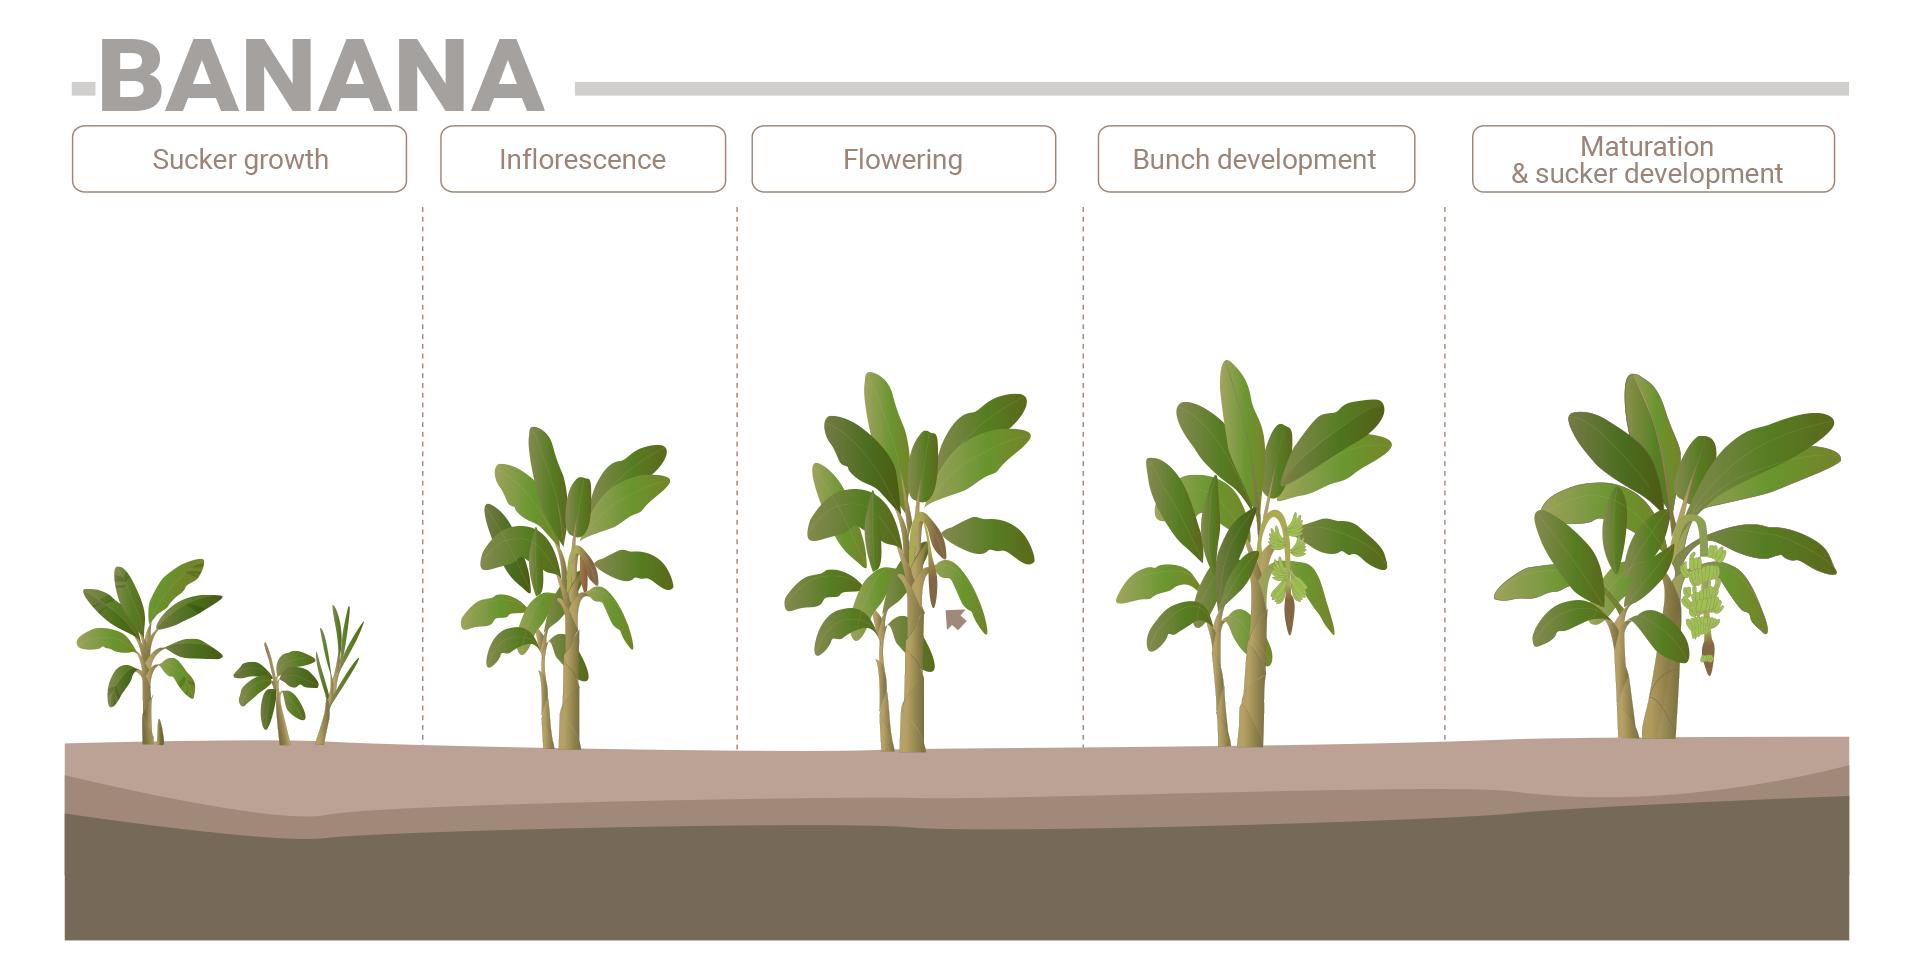 Banana phenological phases